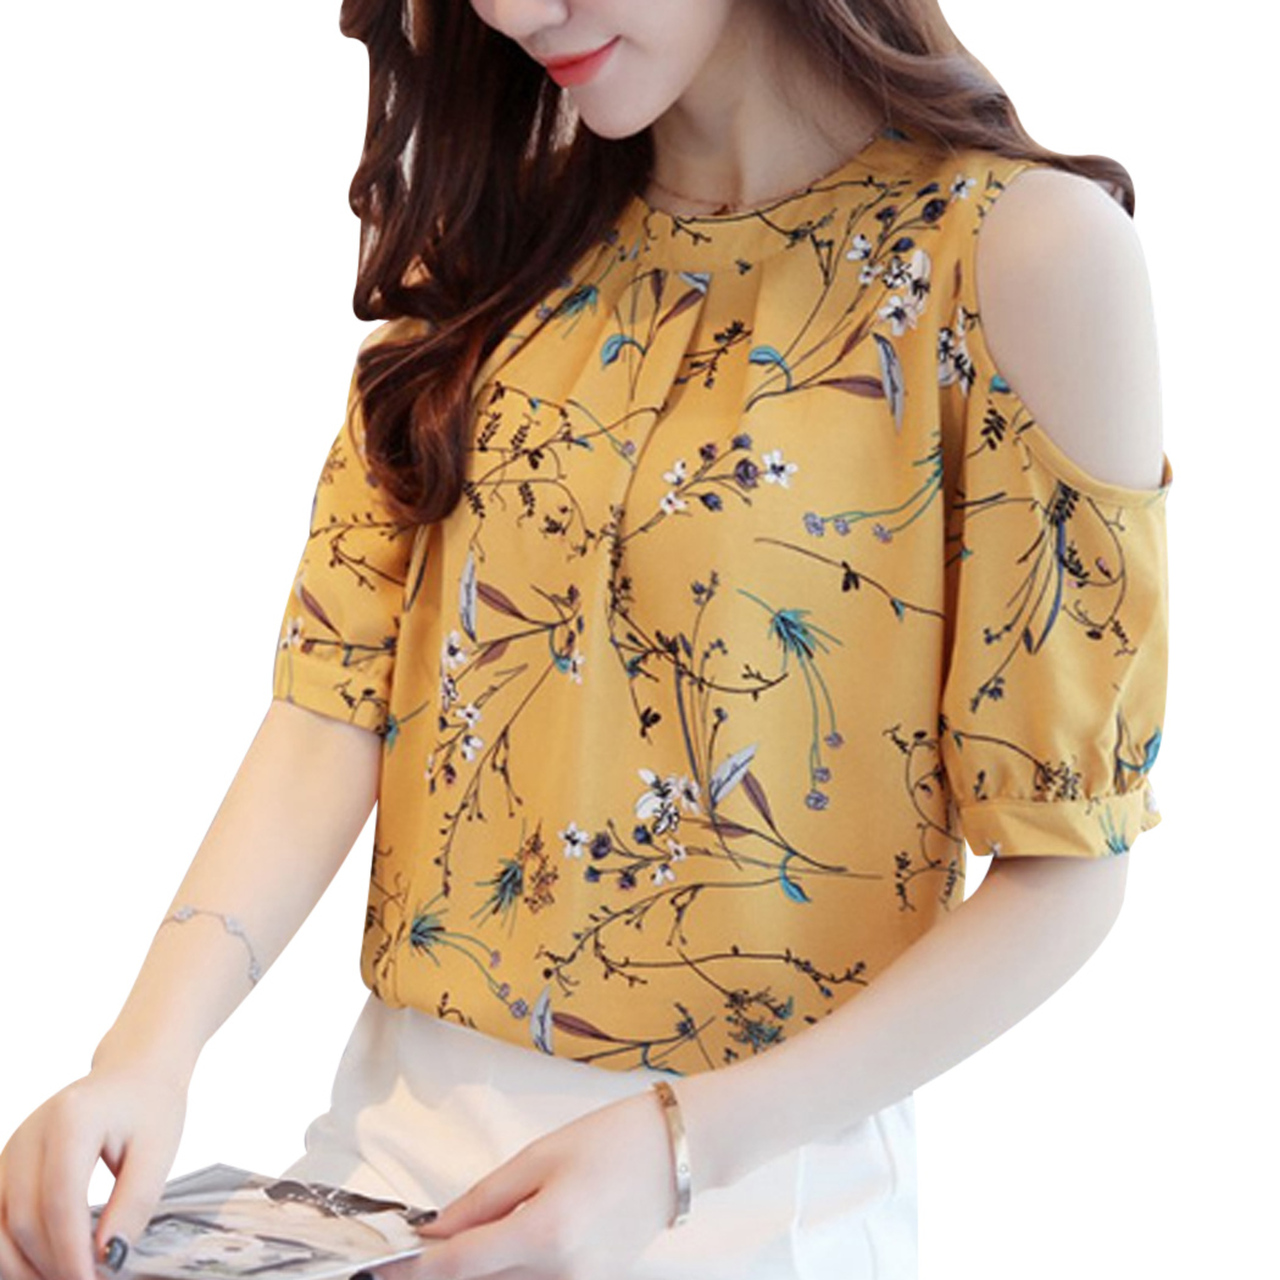 091267b3a89 2018 Summer Cold Shoulder Chiffon Floral Printed Blouse Shirt Women Tops  Elegant Plus Size Ladies Korea ...